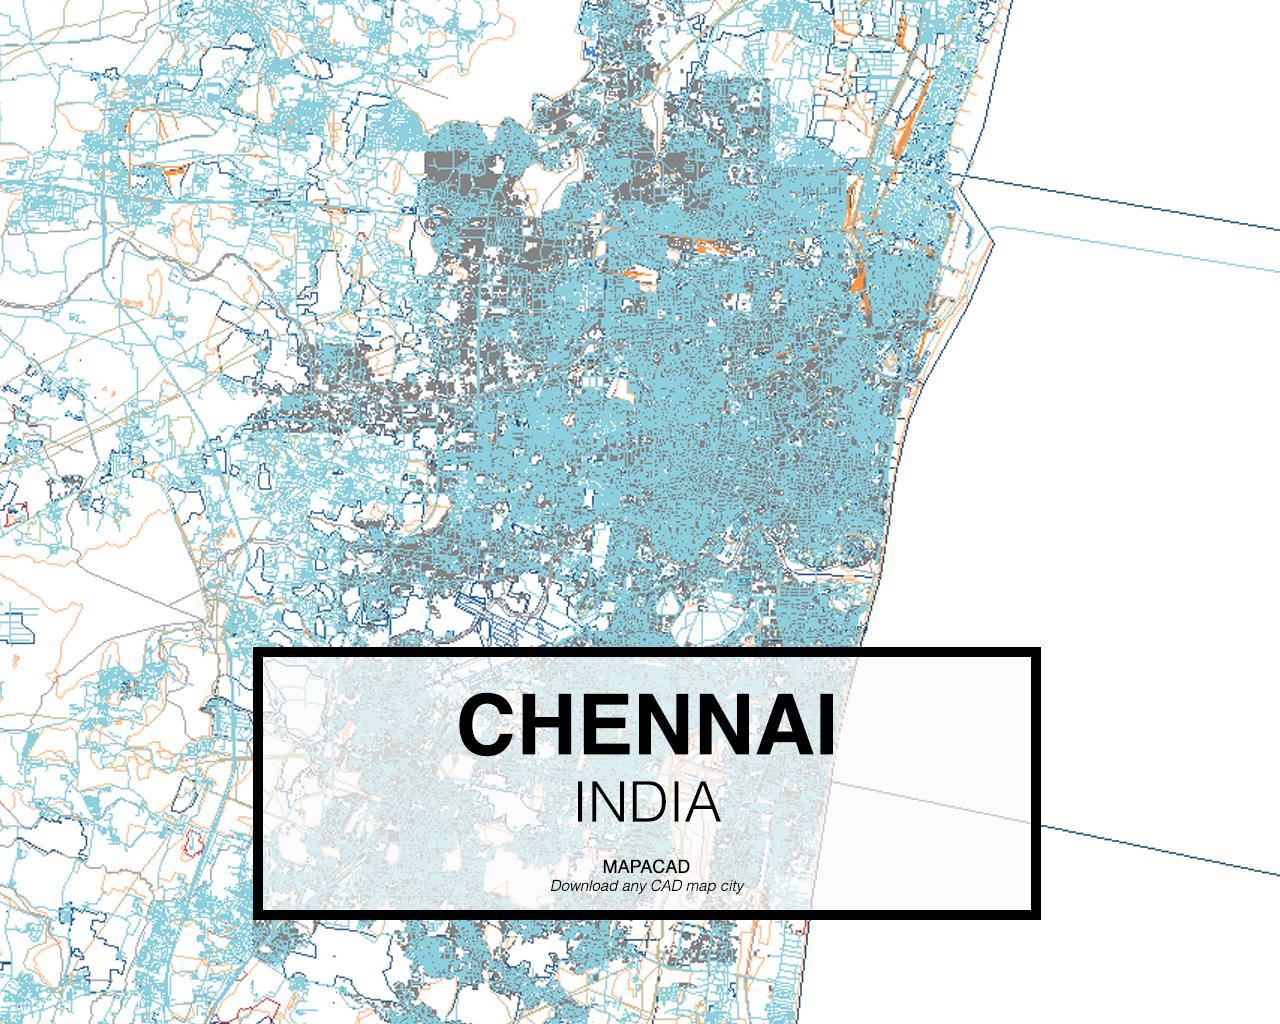 beste online dating sites in Chennai dating site eerste date tips